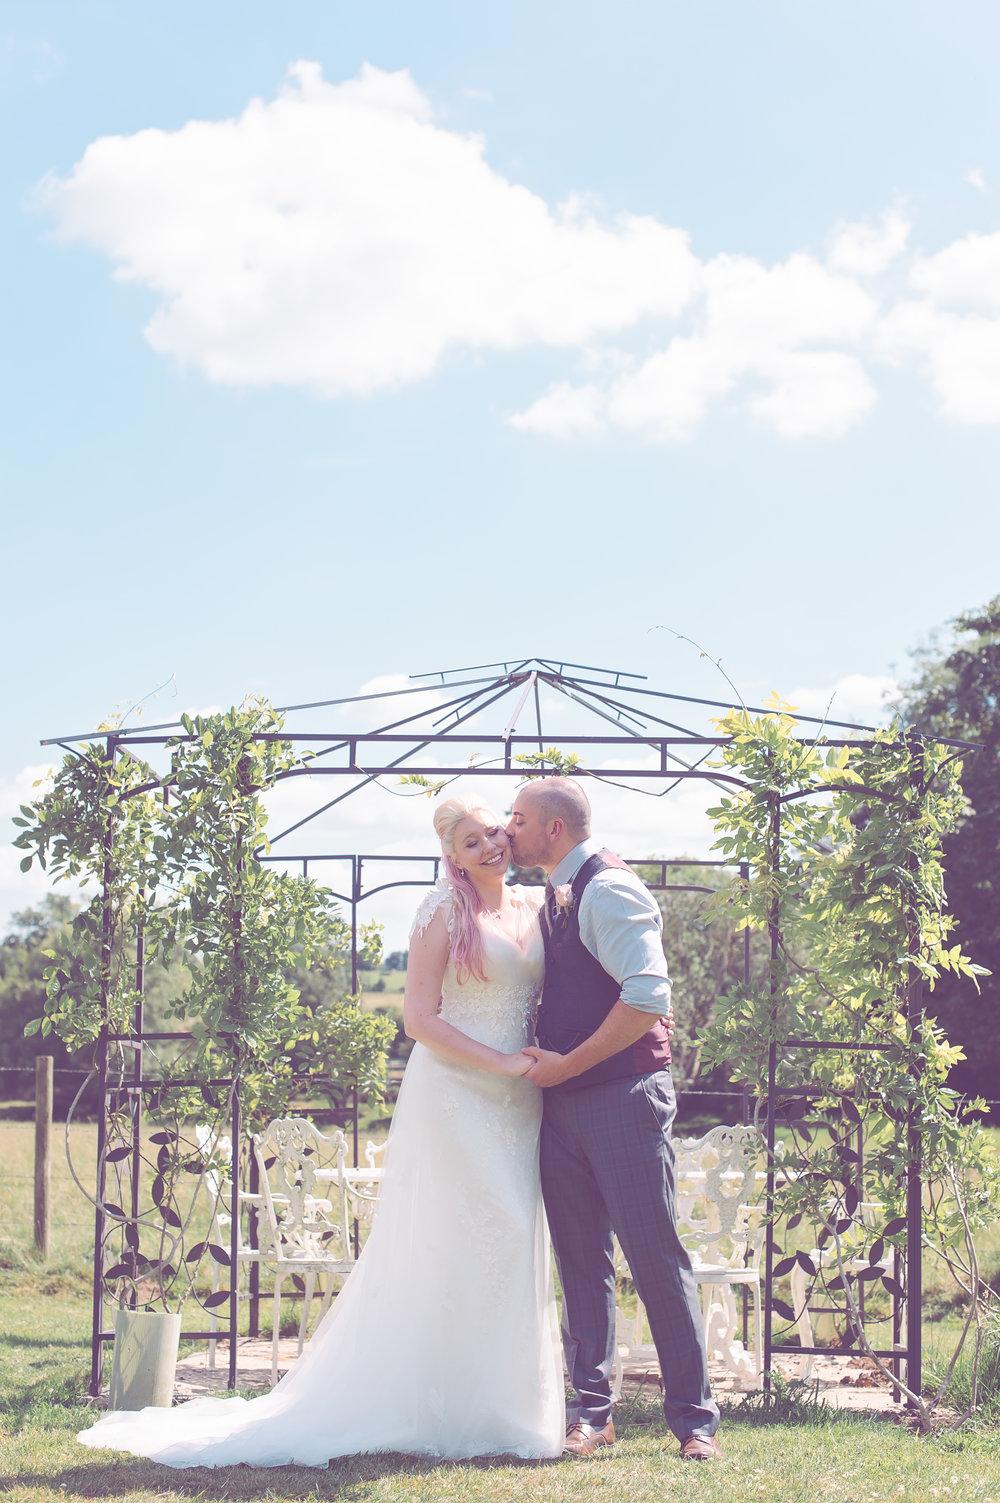 Lauren and Thomas Wedding - 17.06.2017-1461.JPG